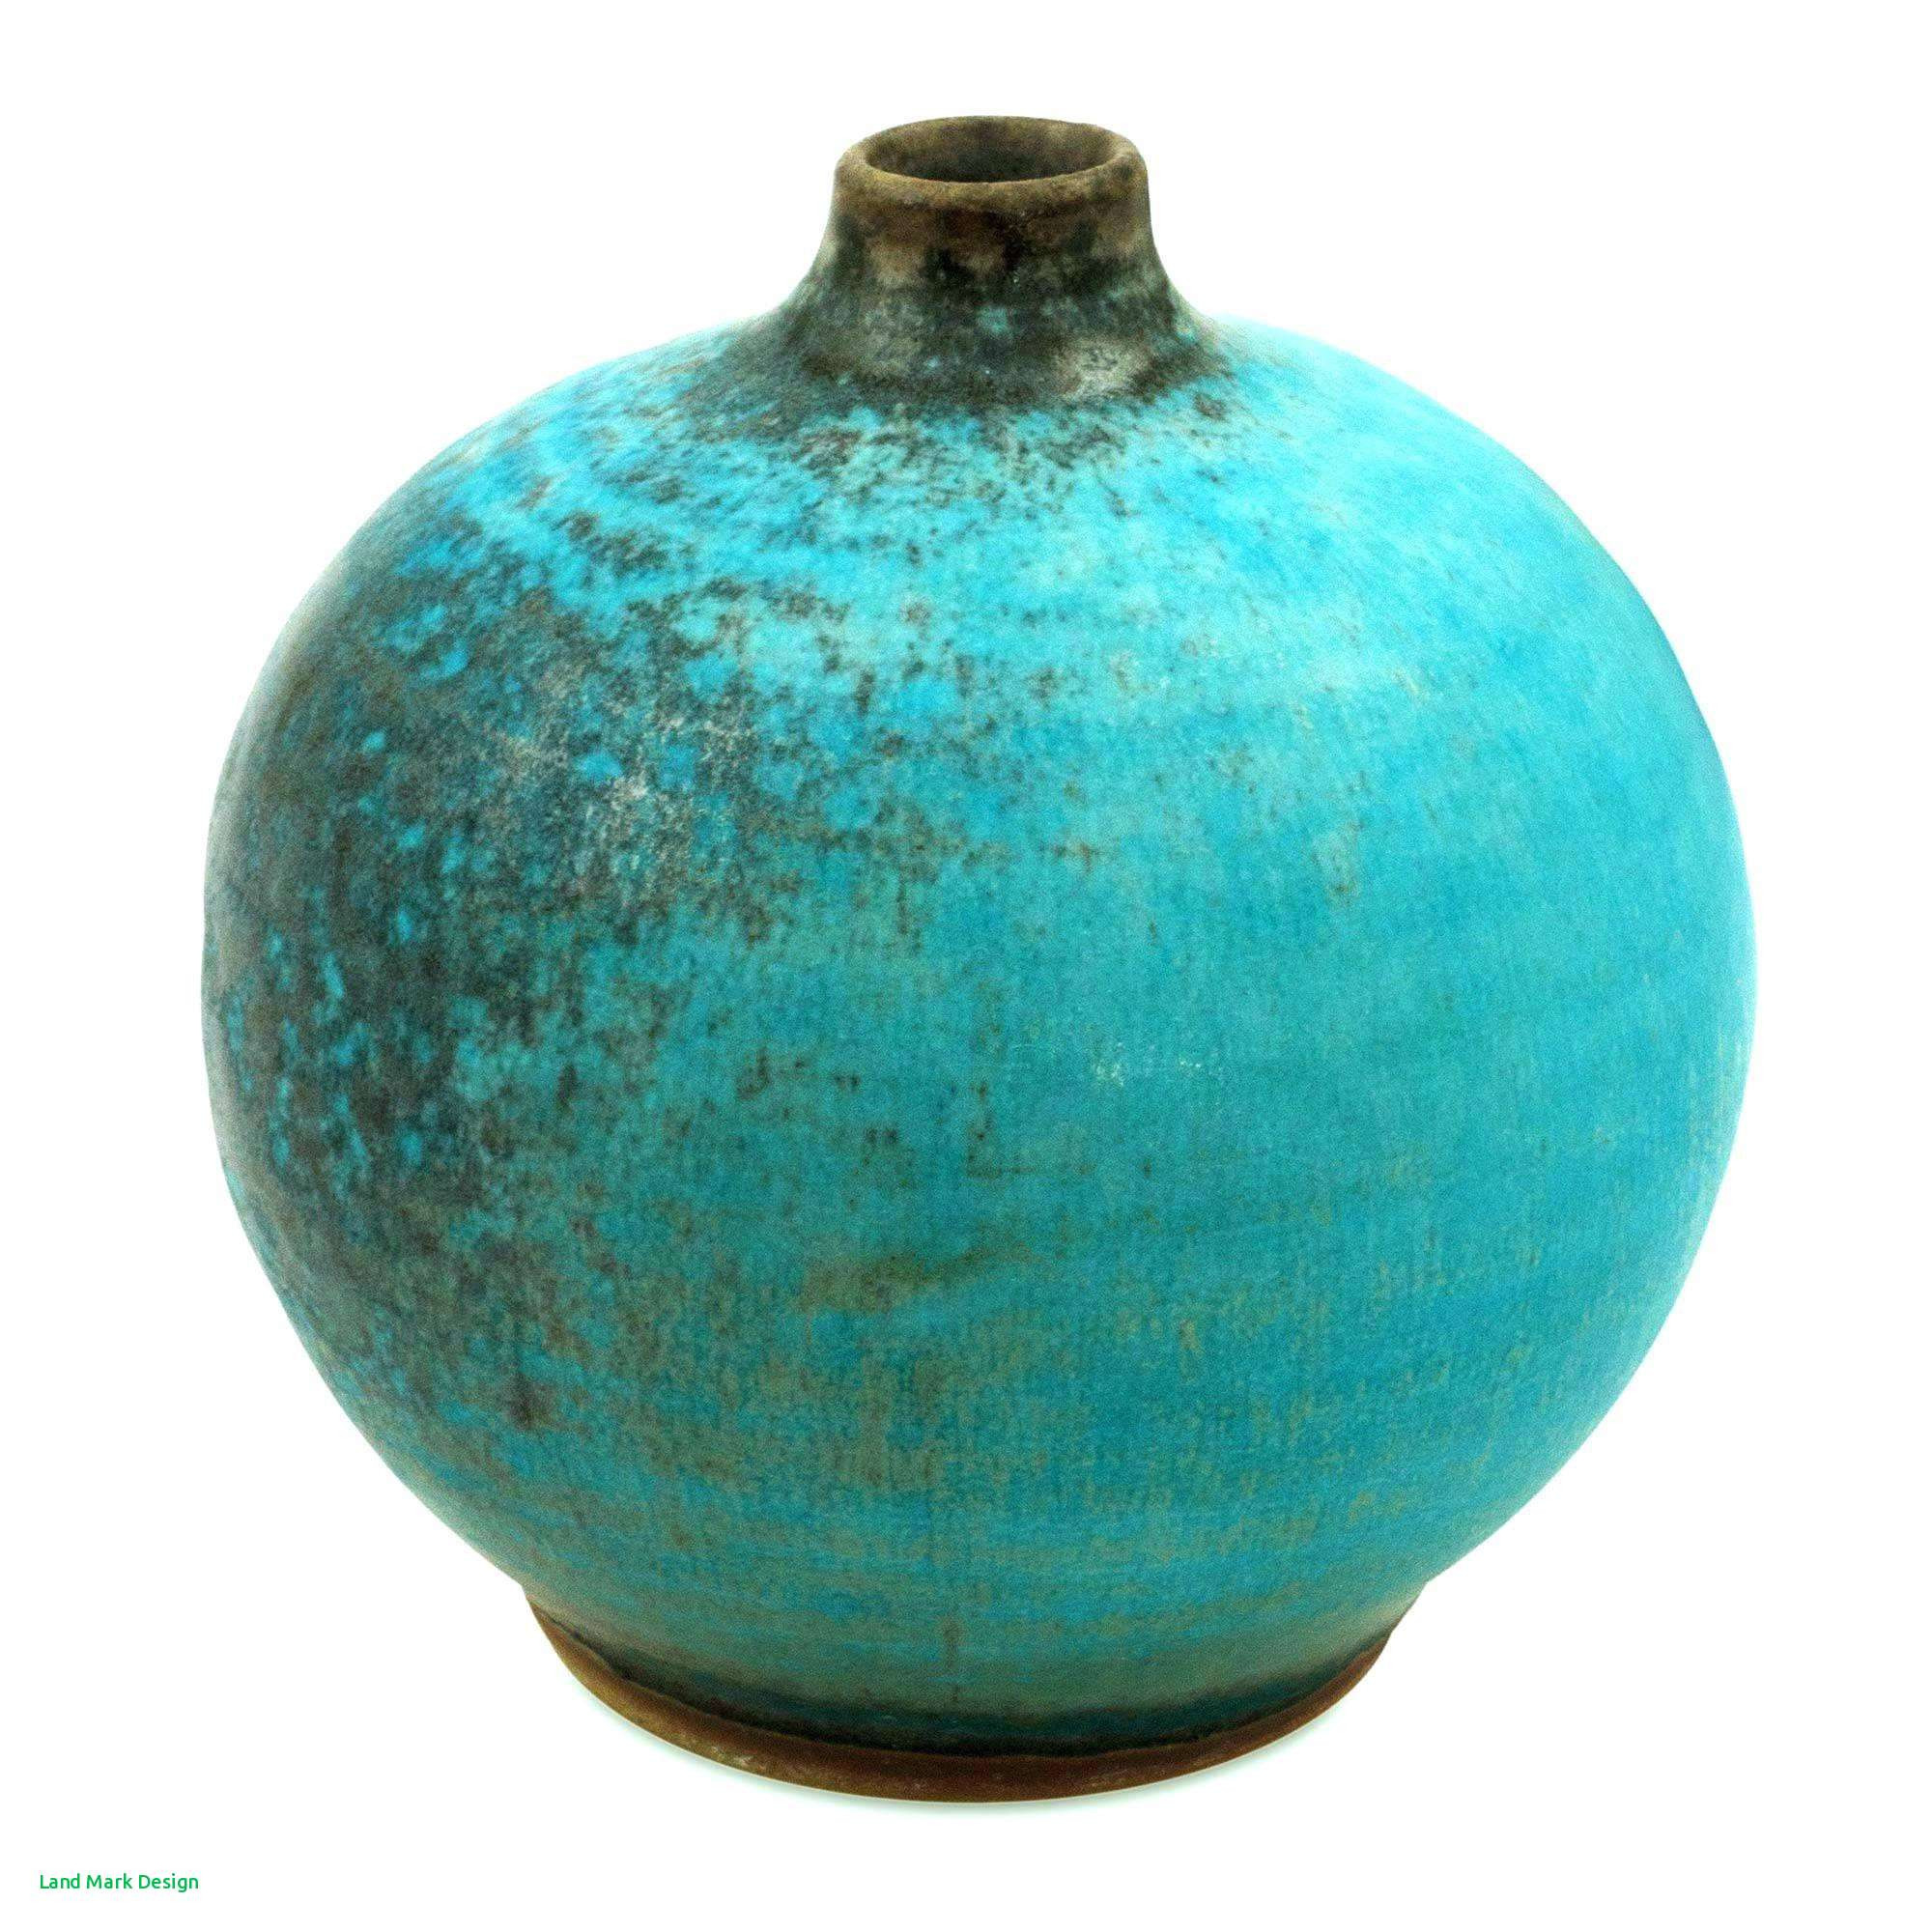 large turquoise vase of teal floor vase design home design with outdoor rug ikea lovely living room ikea vases luxury pe s5h vases ikea floor vase i